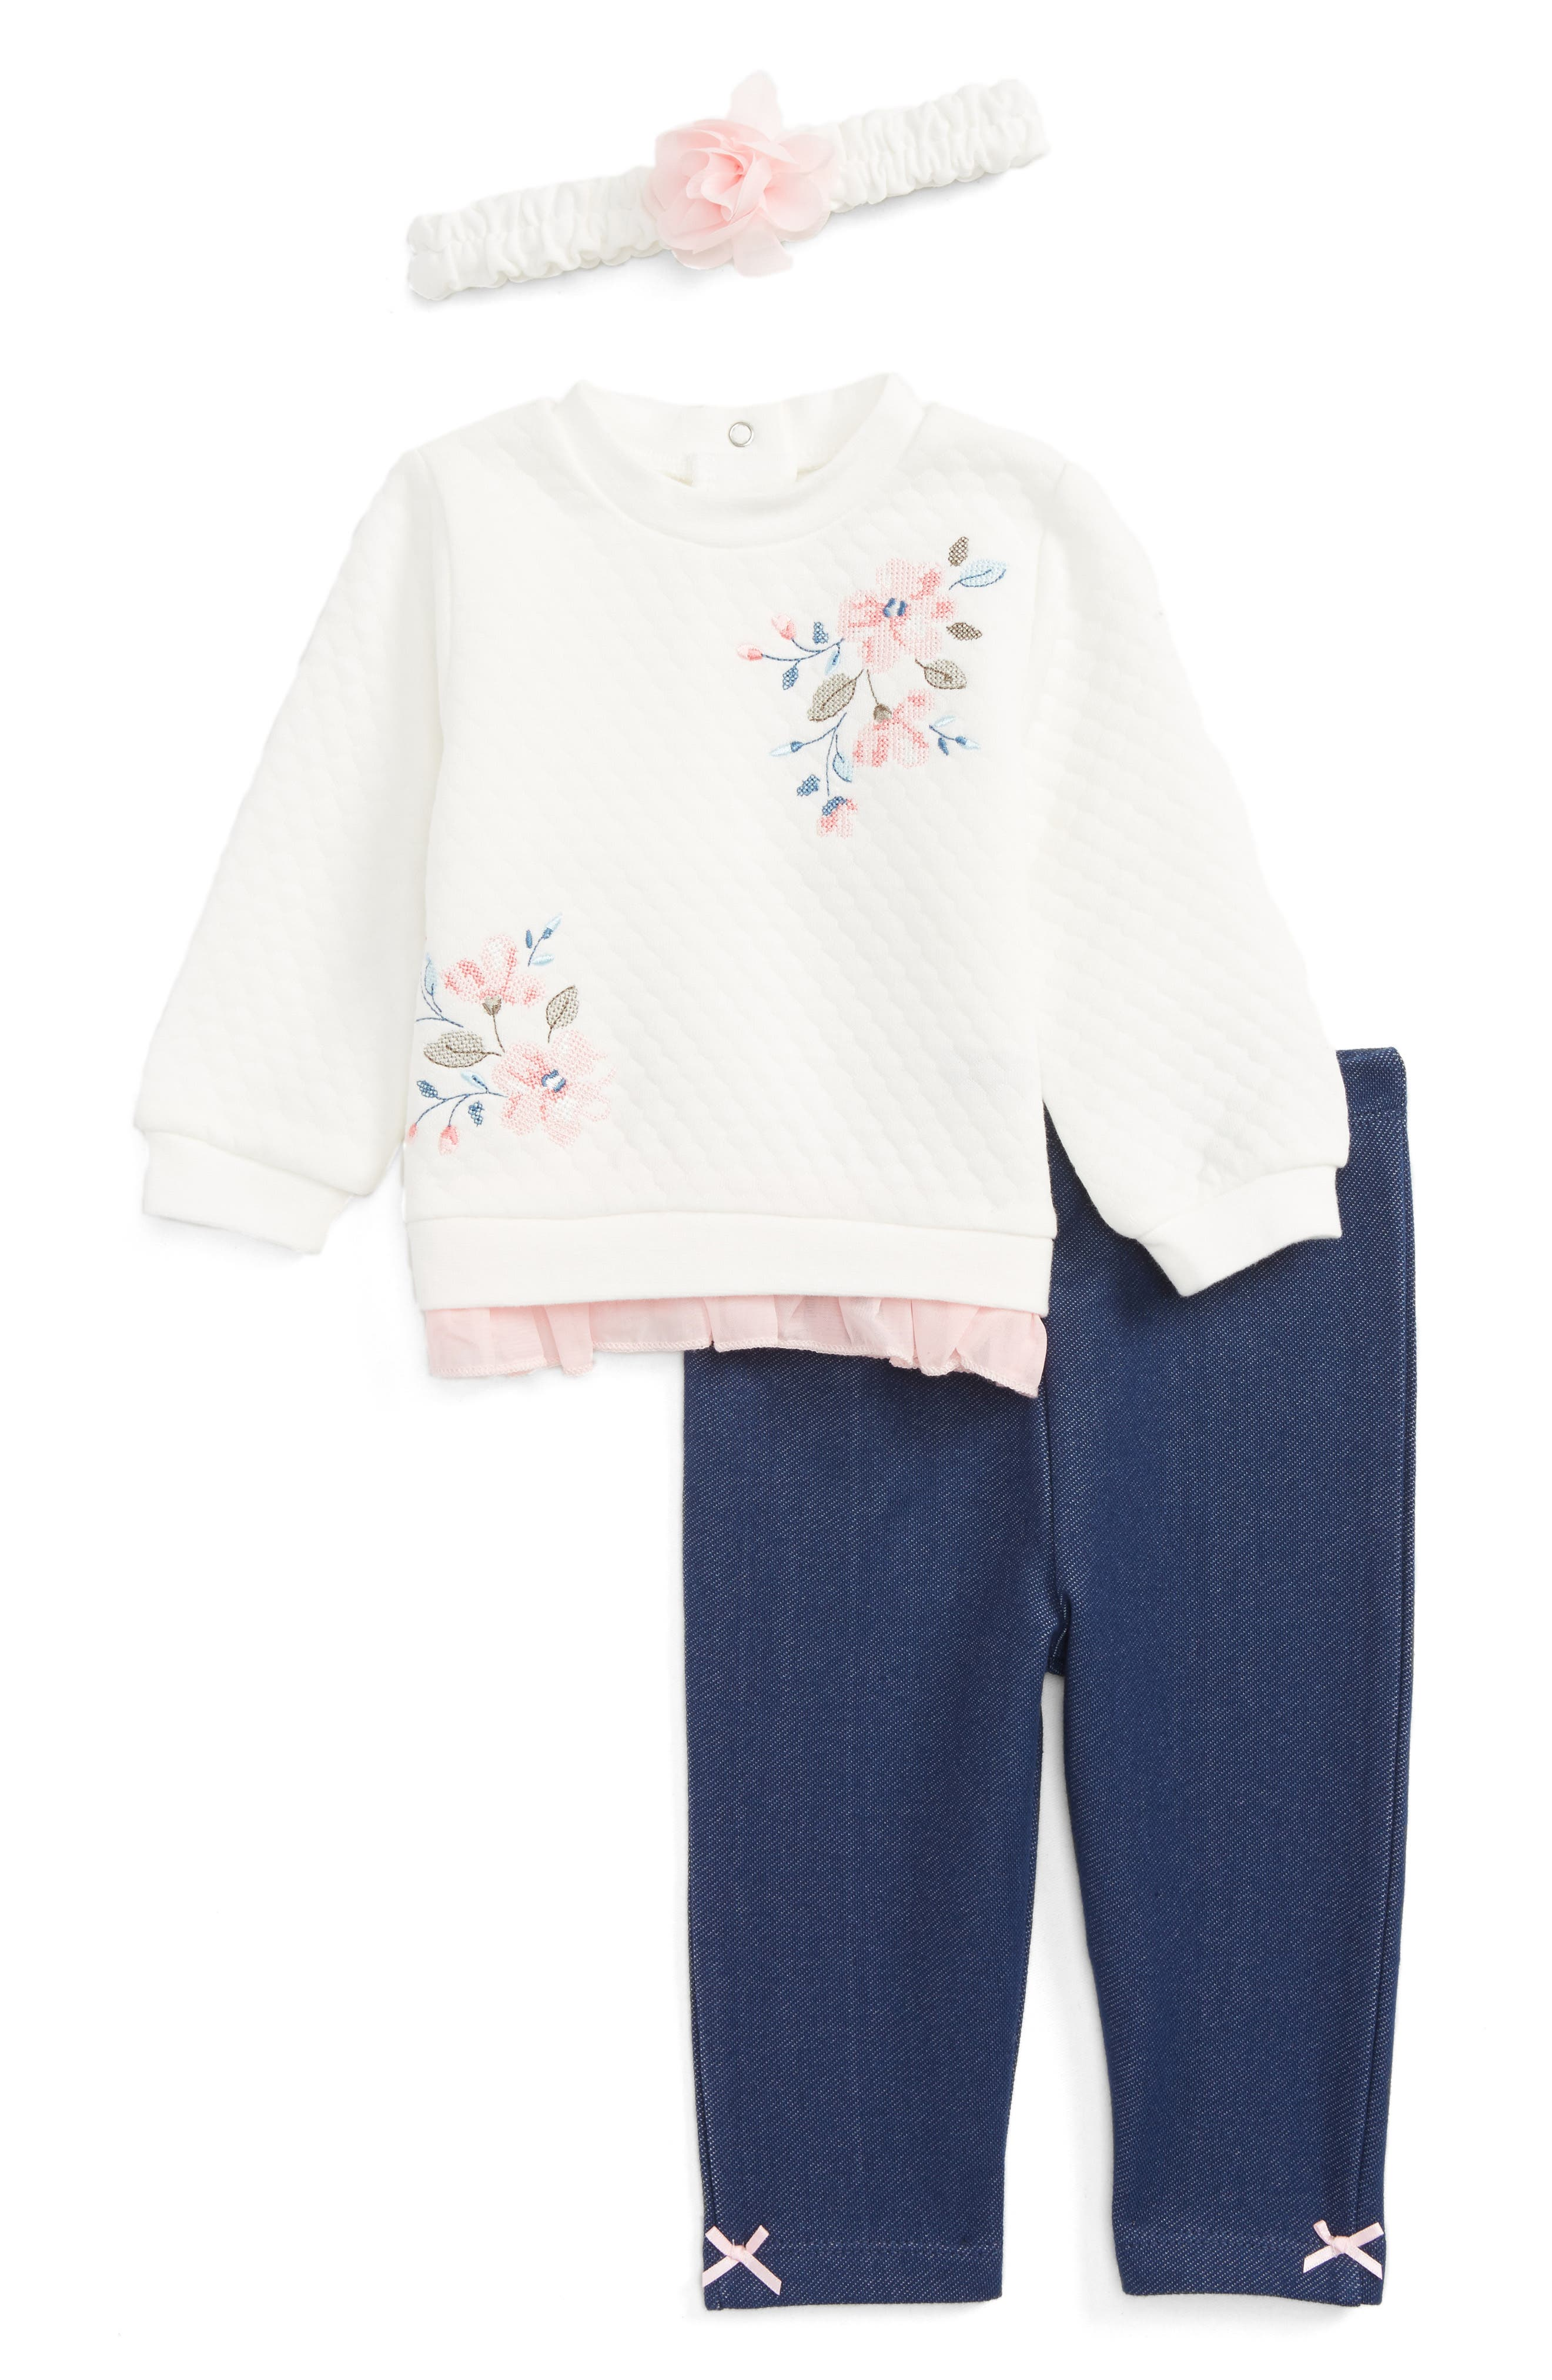 LITTLE ME Blossoms Tunic, Leggings & Headband Set